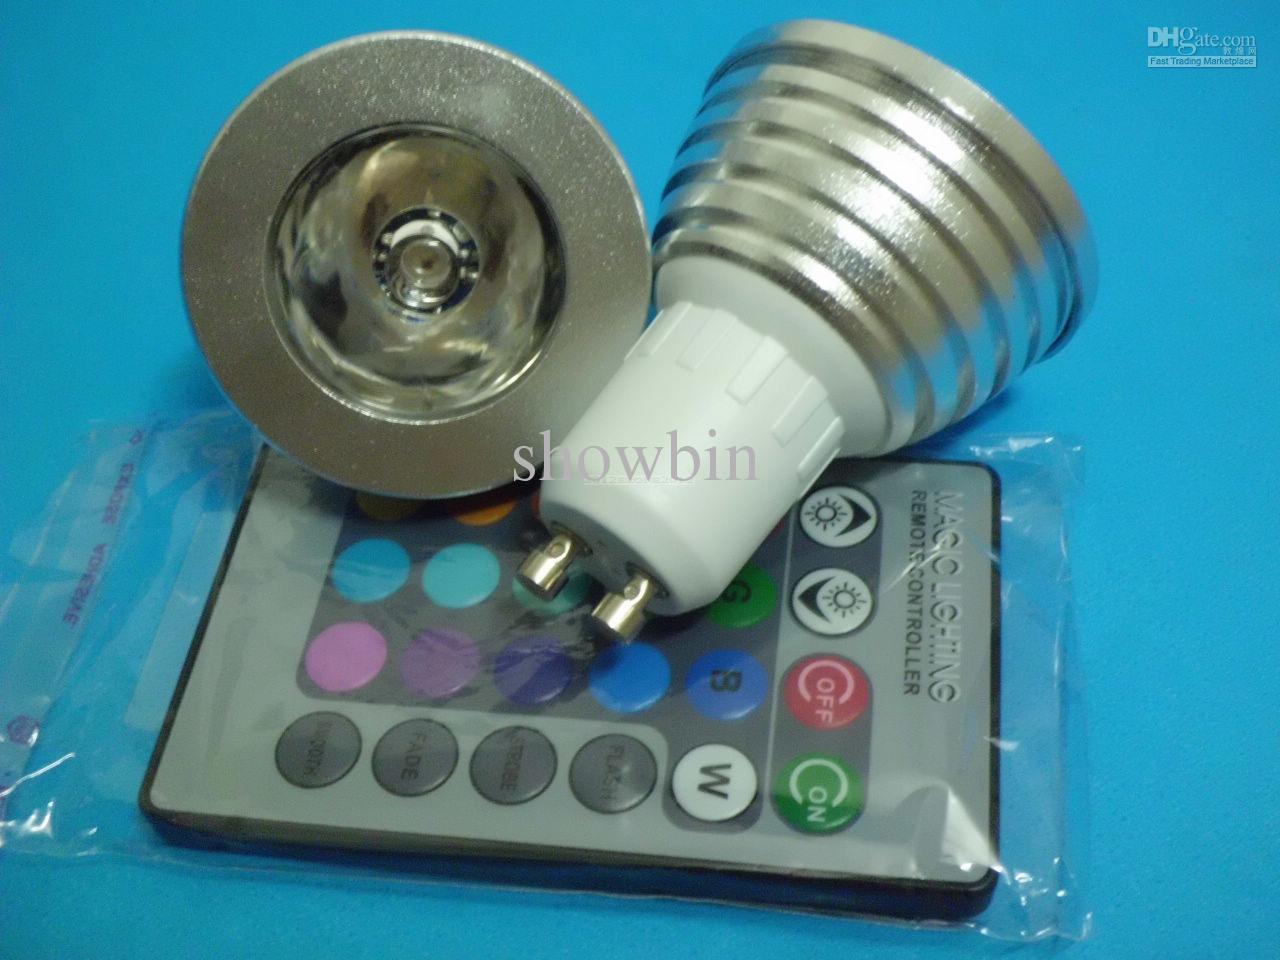 Gu10 RGB LED Magic Lighting Remote Control 16 Colors Change L& 3w 85-265v dimmable & Best Gu10 Rgb Led Magic Lighting Remote Control Change Lamp 3w 85 ... azcodes.com